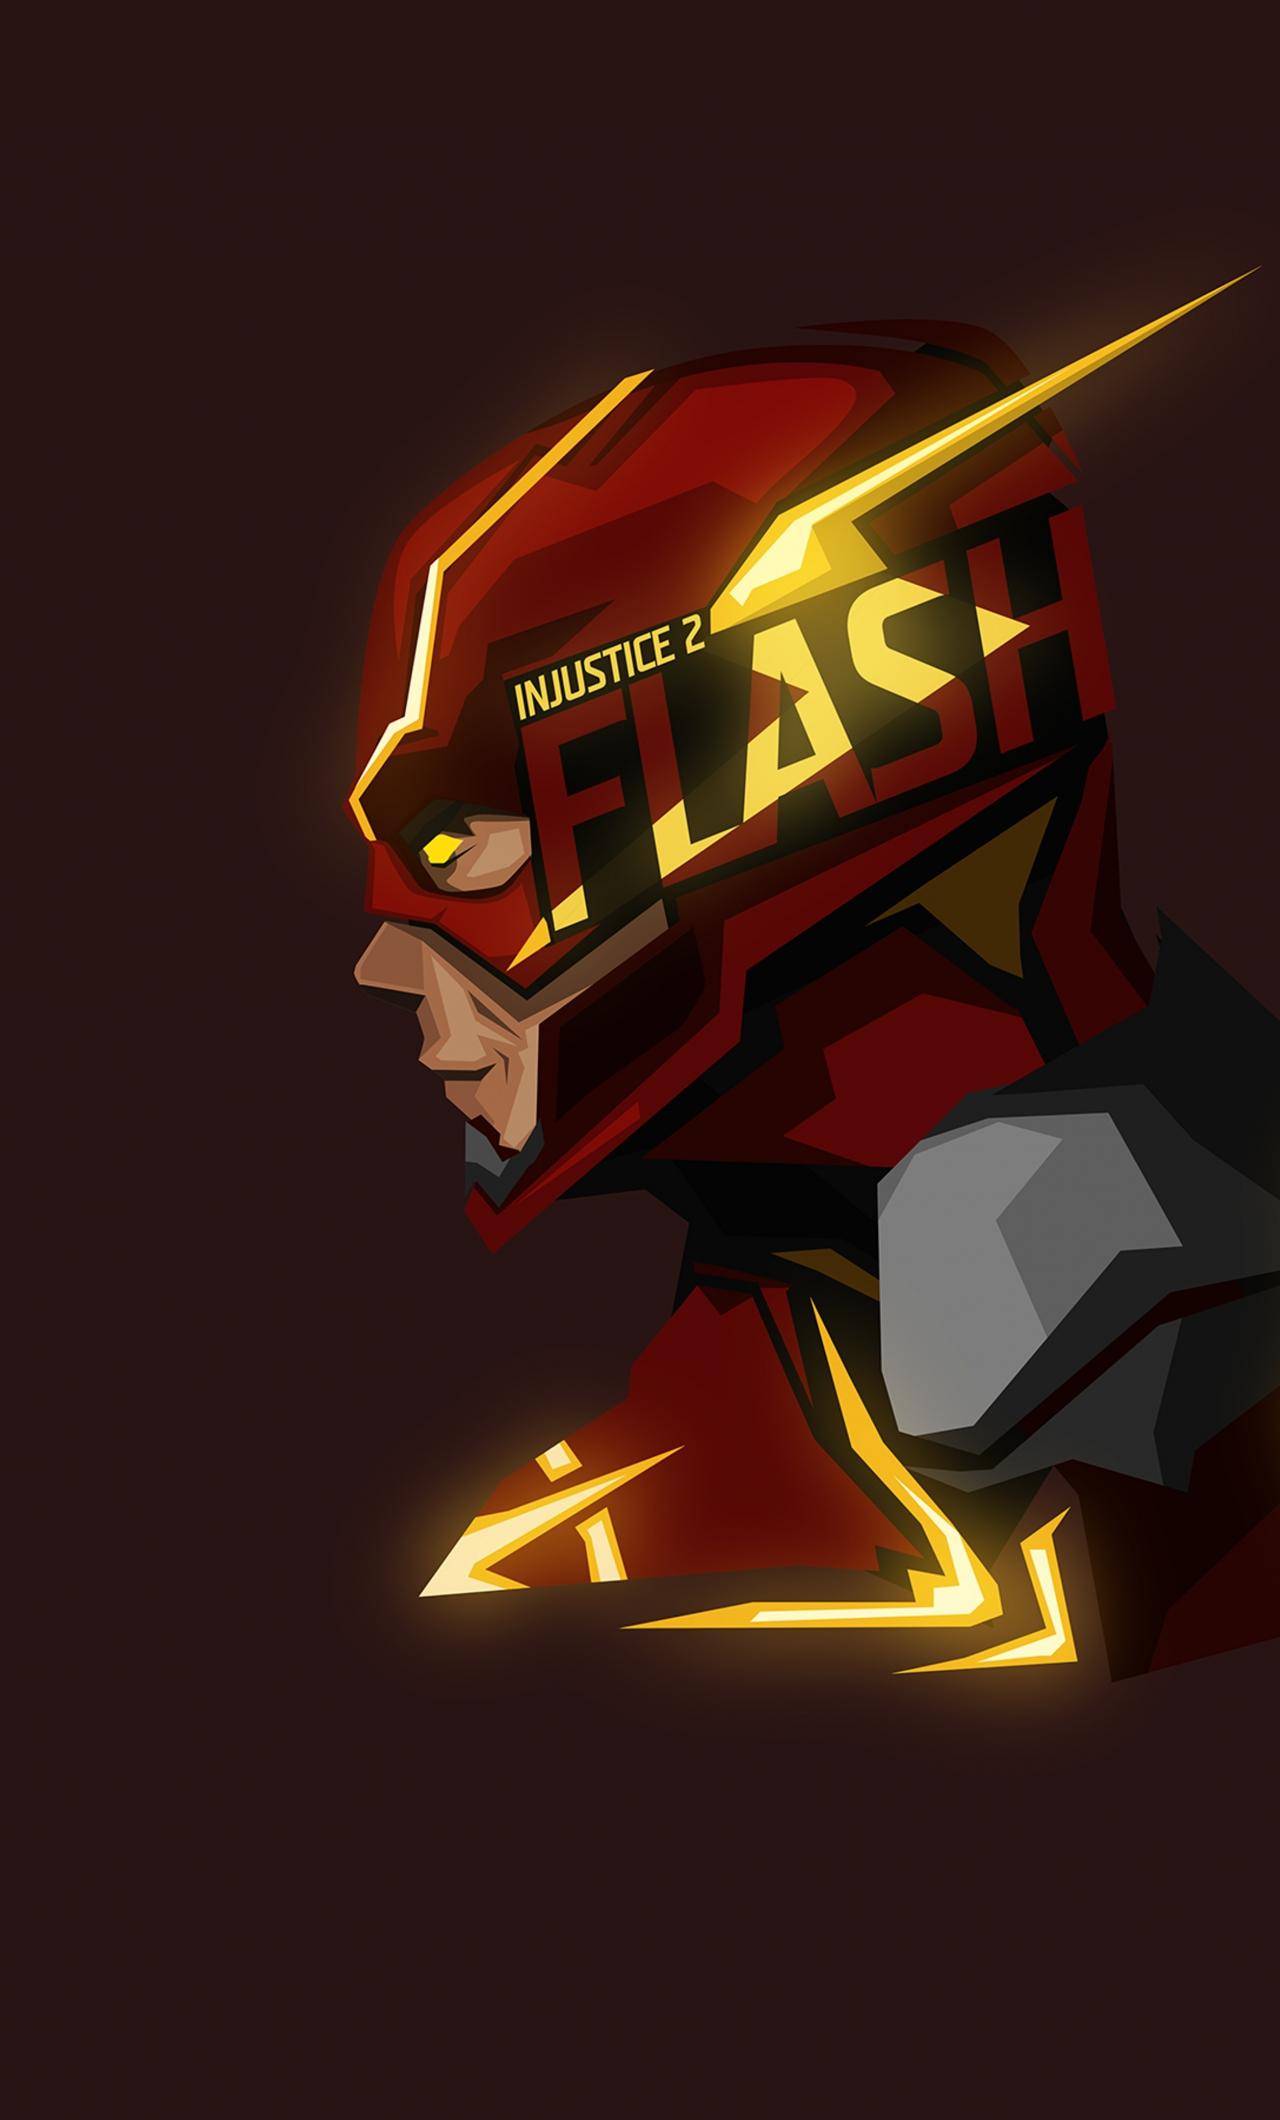 Download 1280x2120 Wallpaper Flash Headshot Art Iphone 6